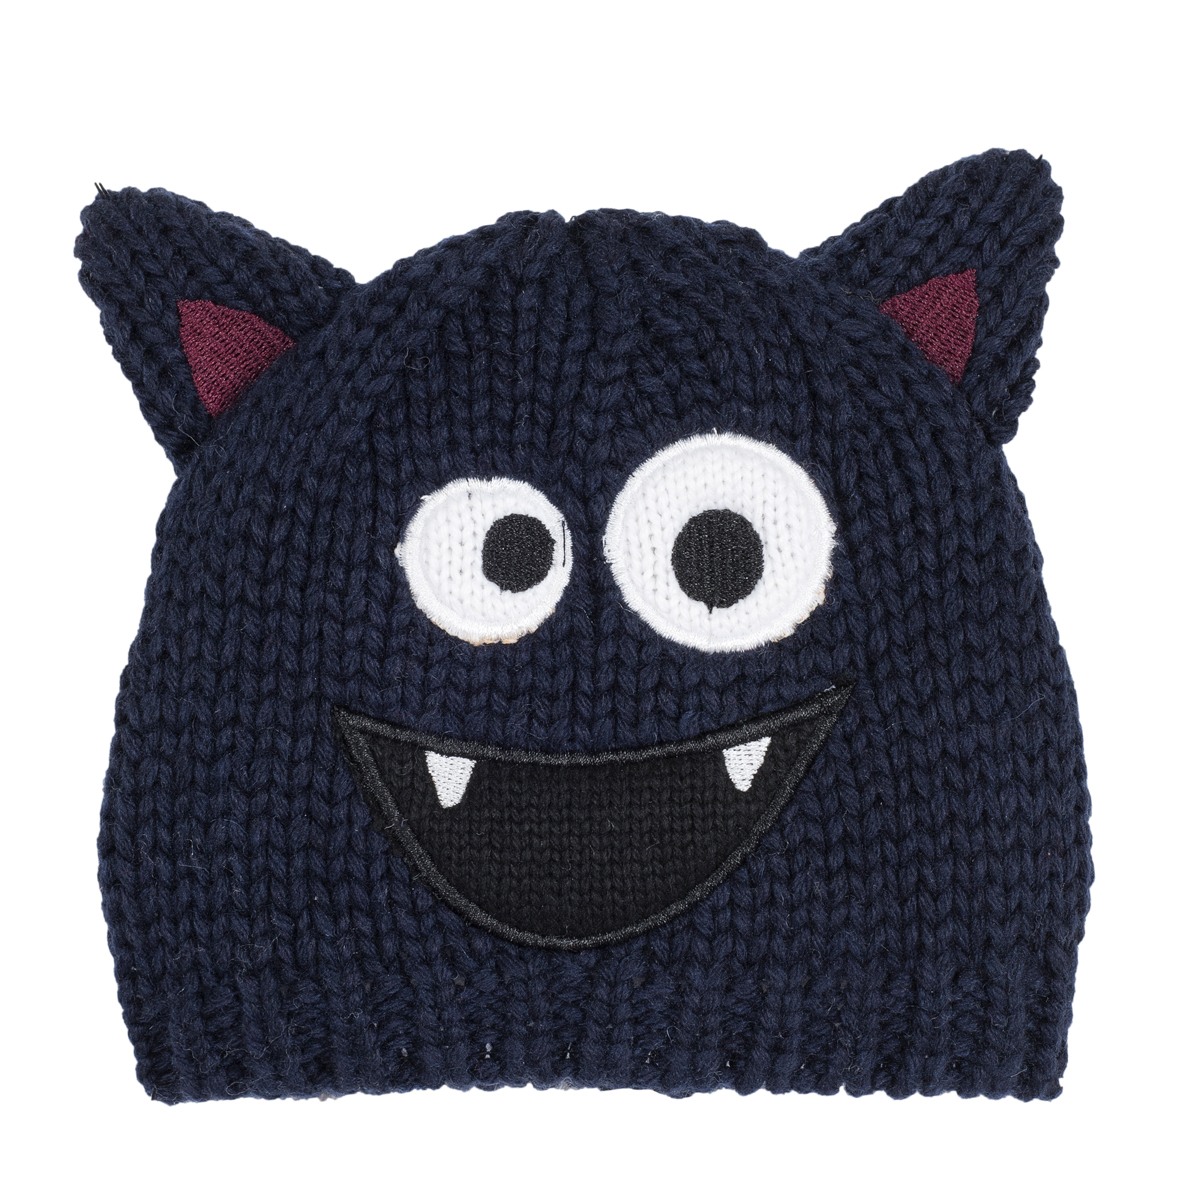 Caciula copii Chicco, tricotata, urechiuse, 04545 din categoria Caciuli, Sepci